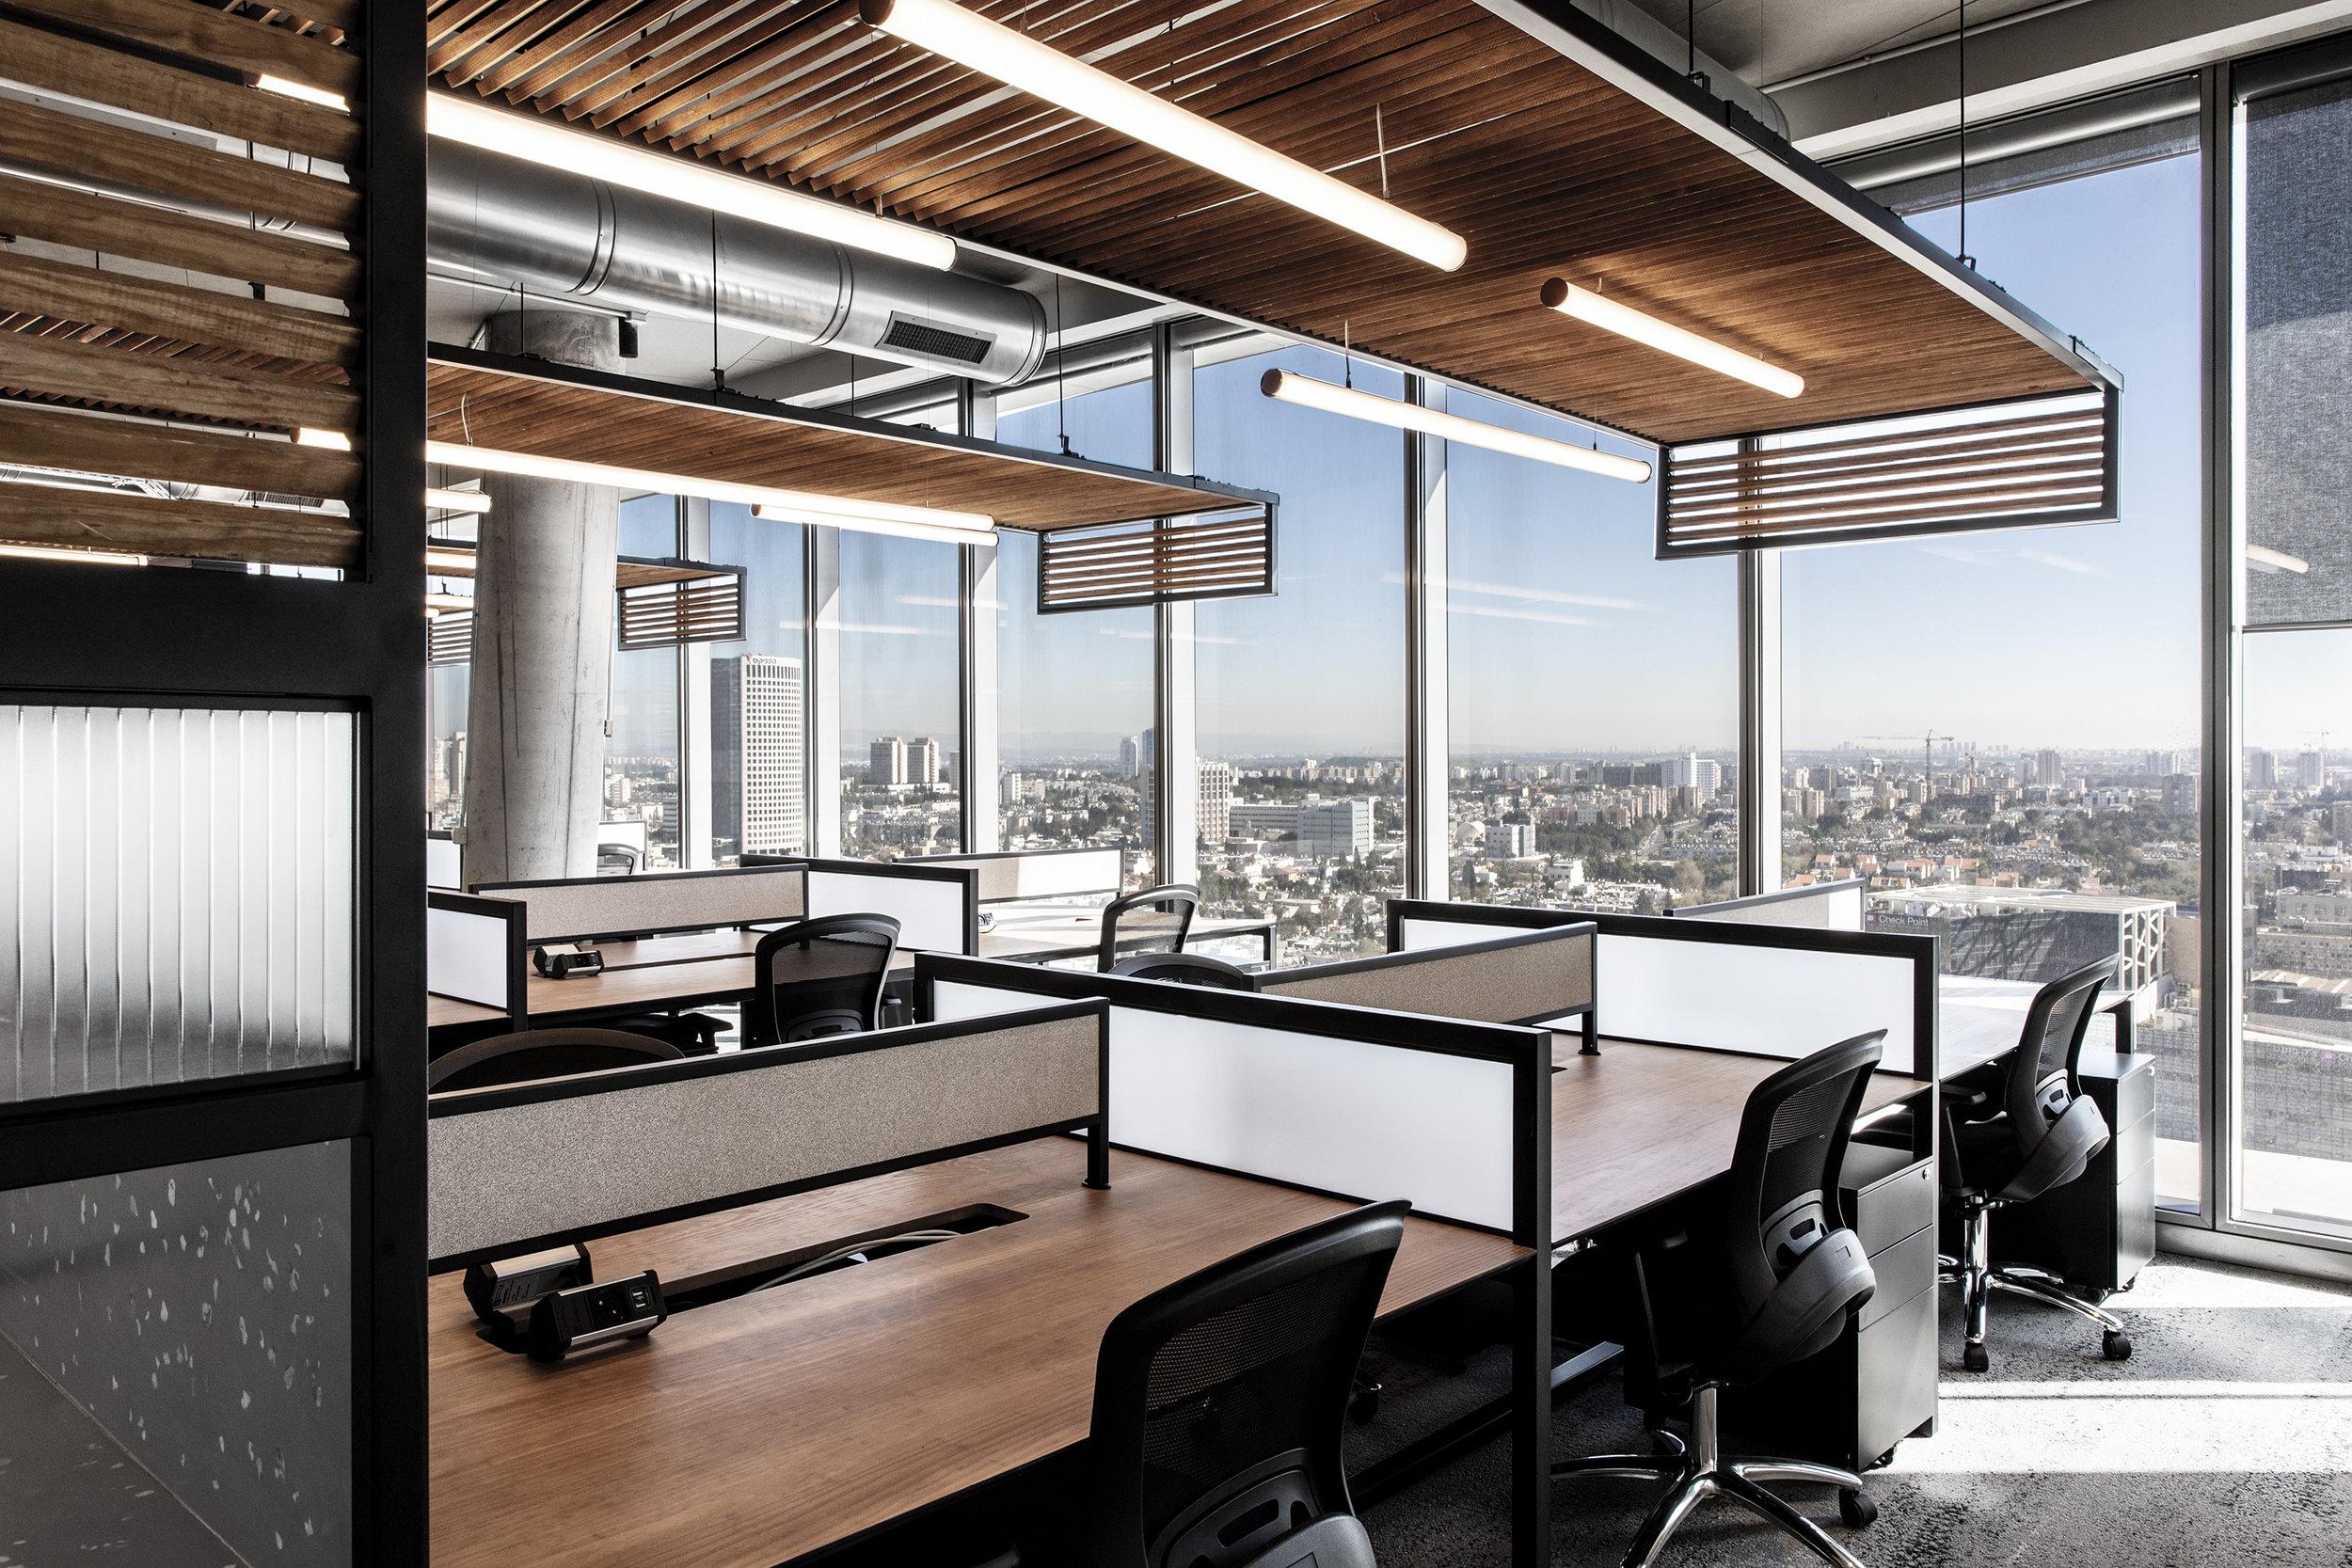 רואי דוד אדריכלות - אדריכל - נטורל אינטליג'נס - ROY DAVID - ARCHITECTURE - ARCHITECT - NI (87).jpg